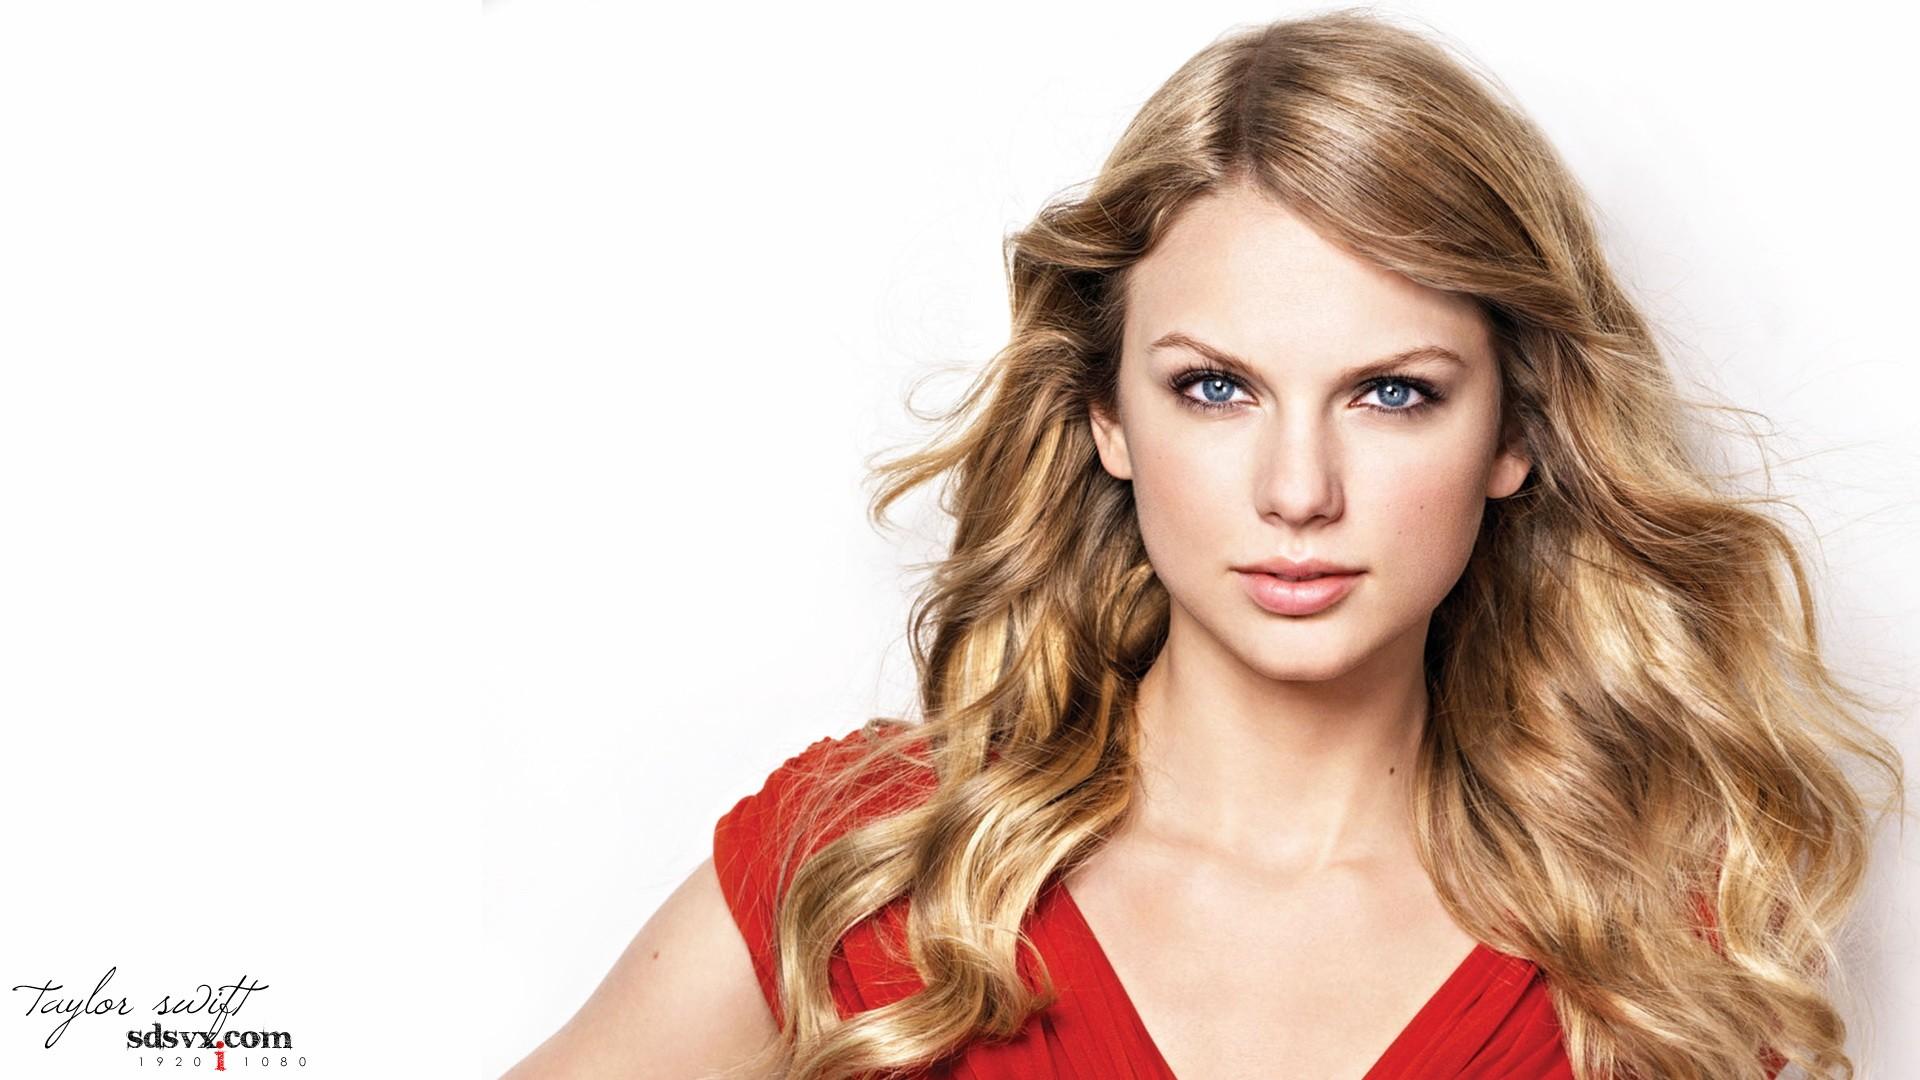 Blondes women music Taylor Swift models celebrity singers white background wallpaper | 1920x1080 ...